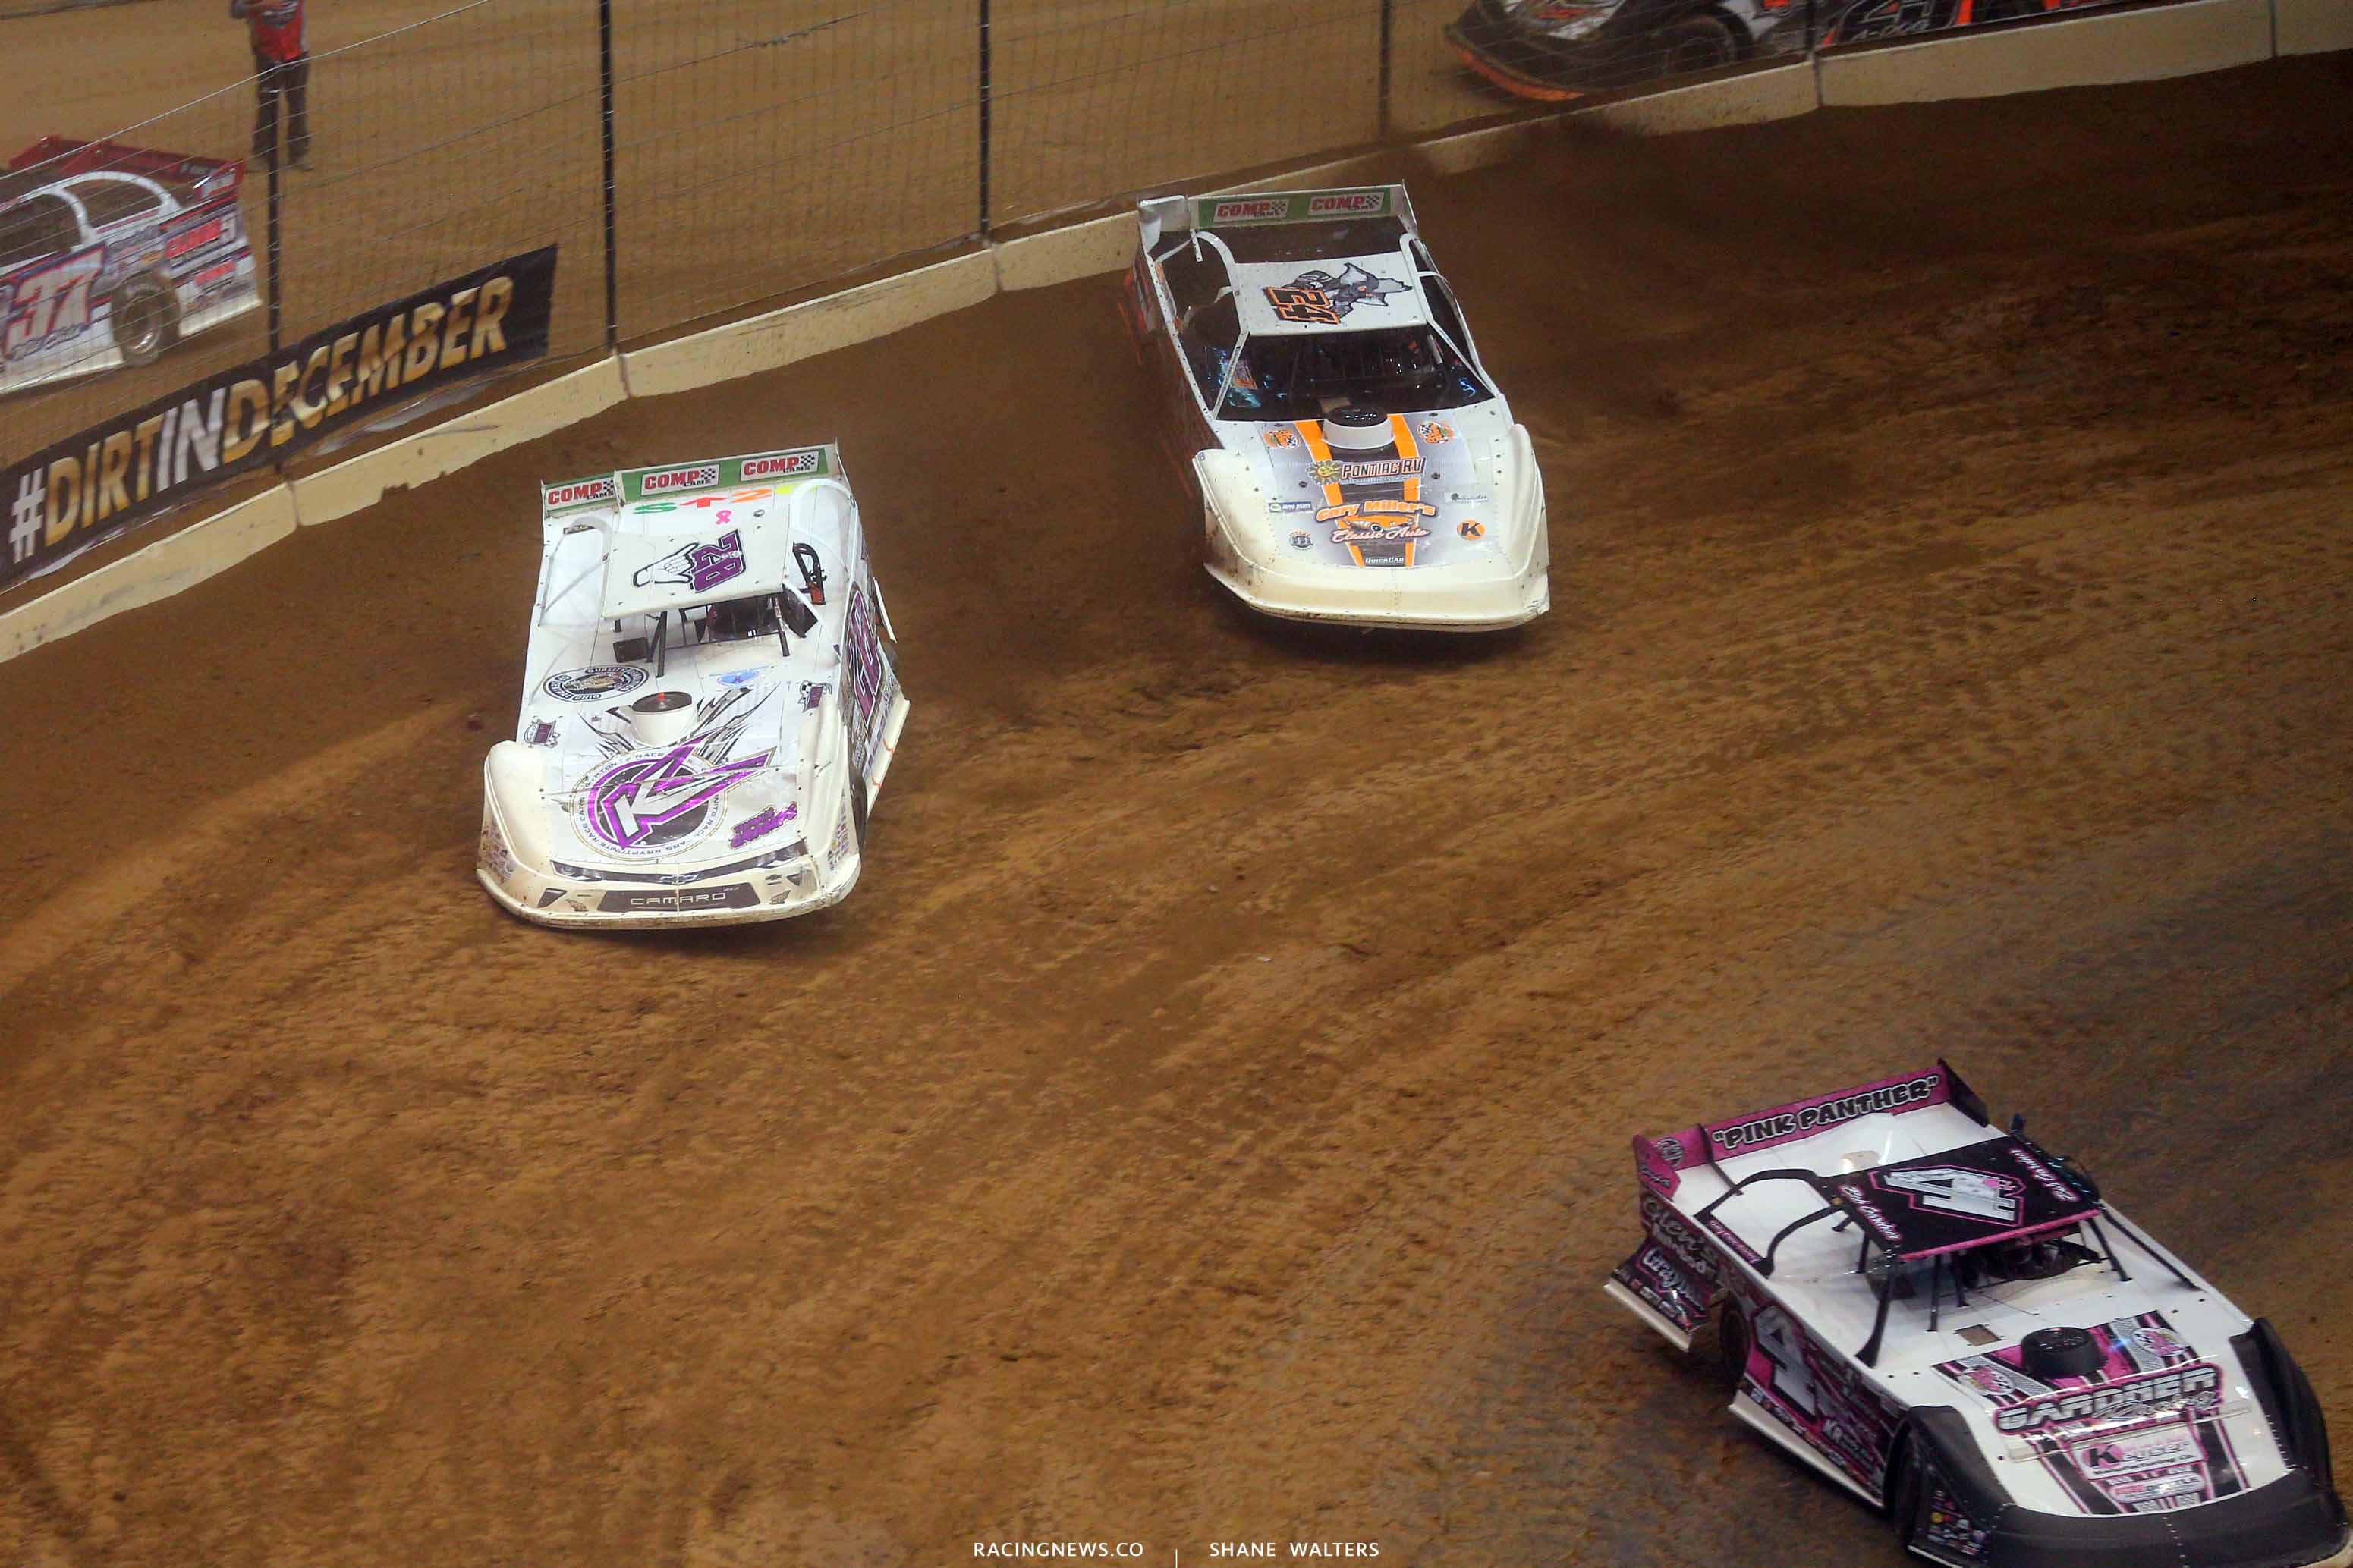 Tyler Carpenter and Ryan Unzicker in the Gateway Dirt Nationals - Dirt Late Model 2394